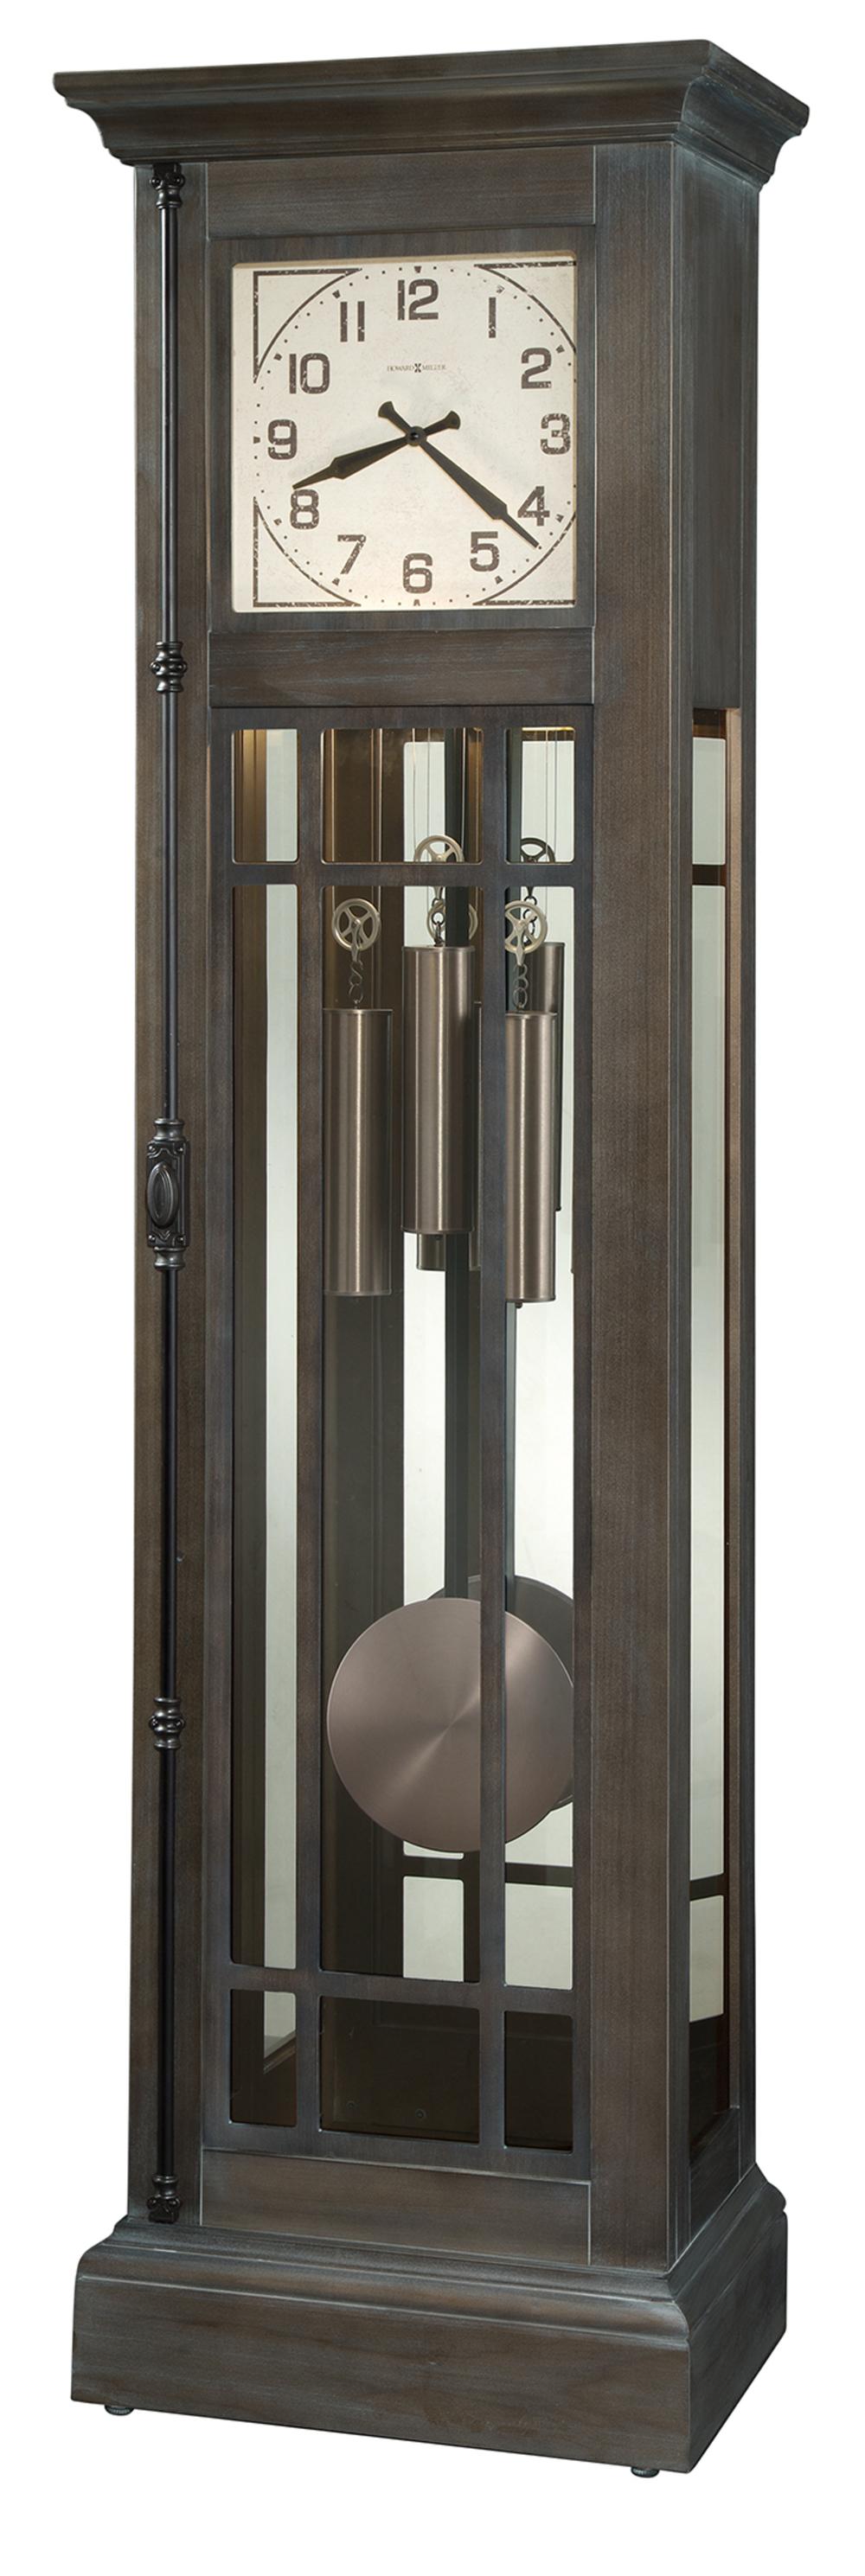 Howard Miller Clock - Amos Floor Clock